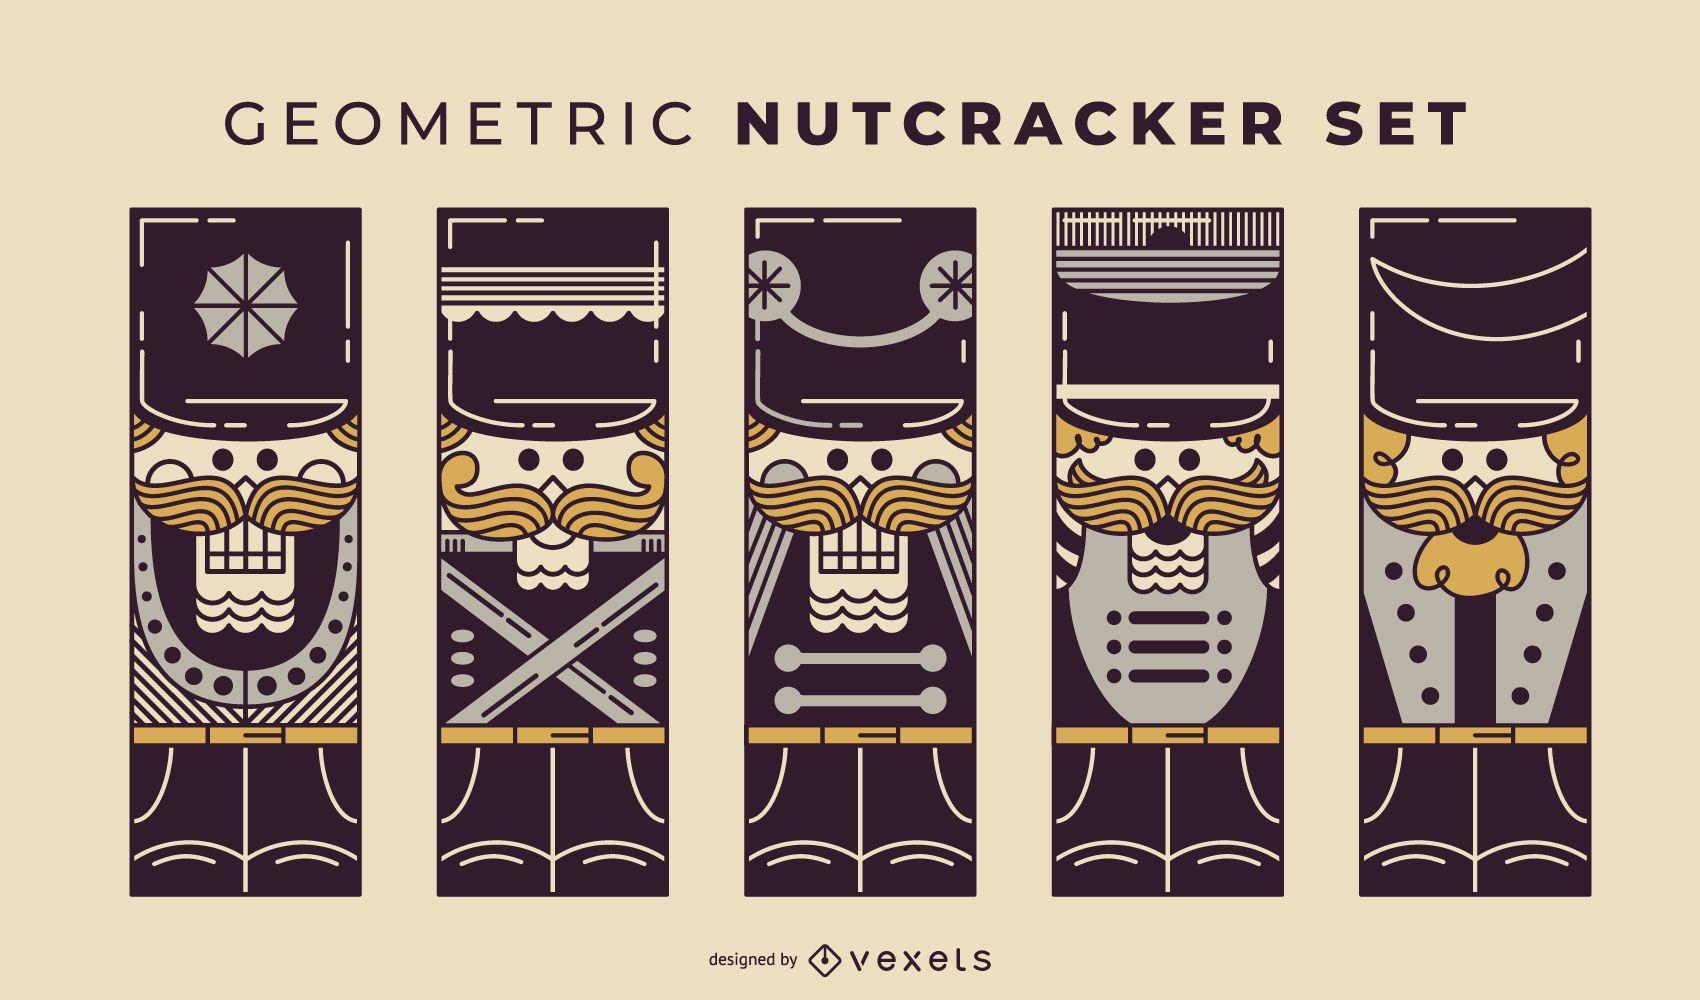 Geometric Nutcracker duotone set